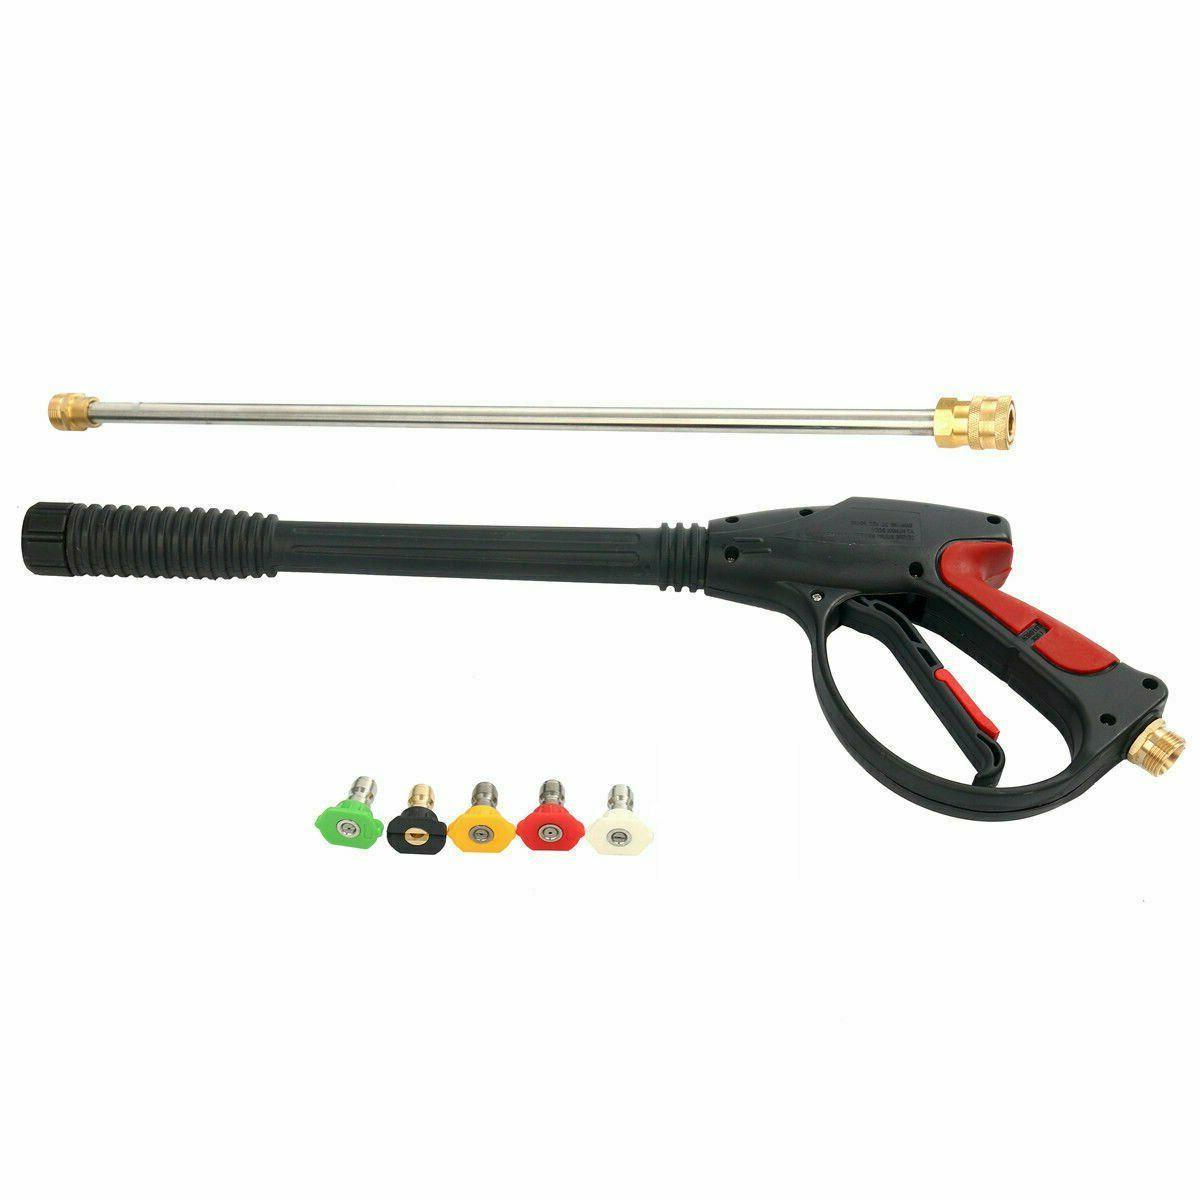 High Car Power Wand/Lance Nozzle Tips Kit